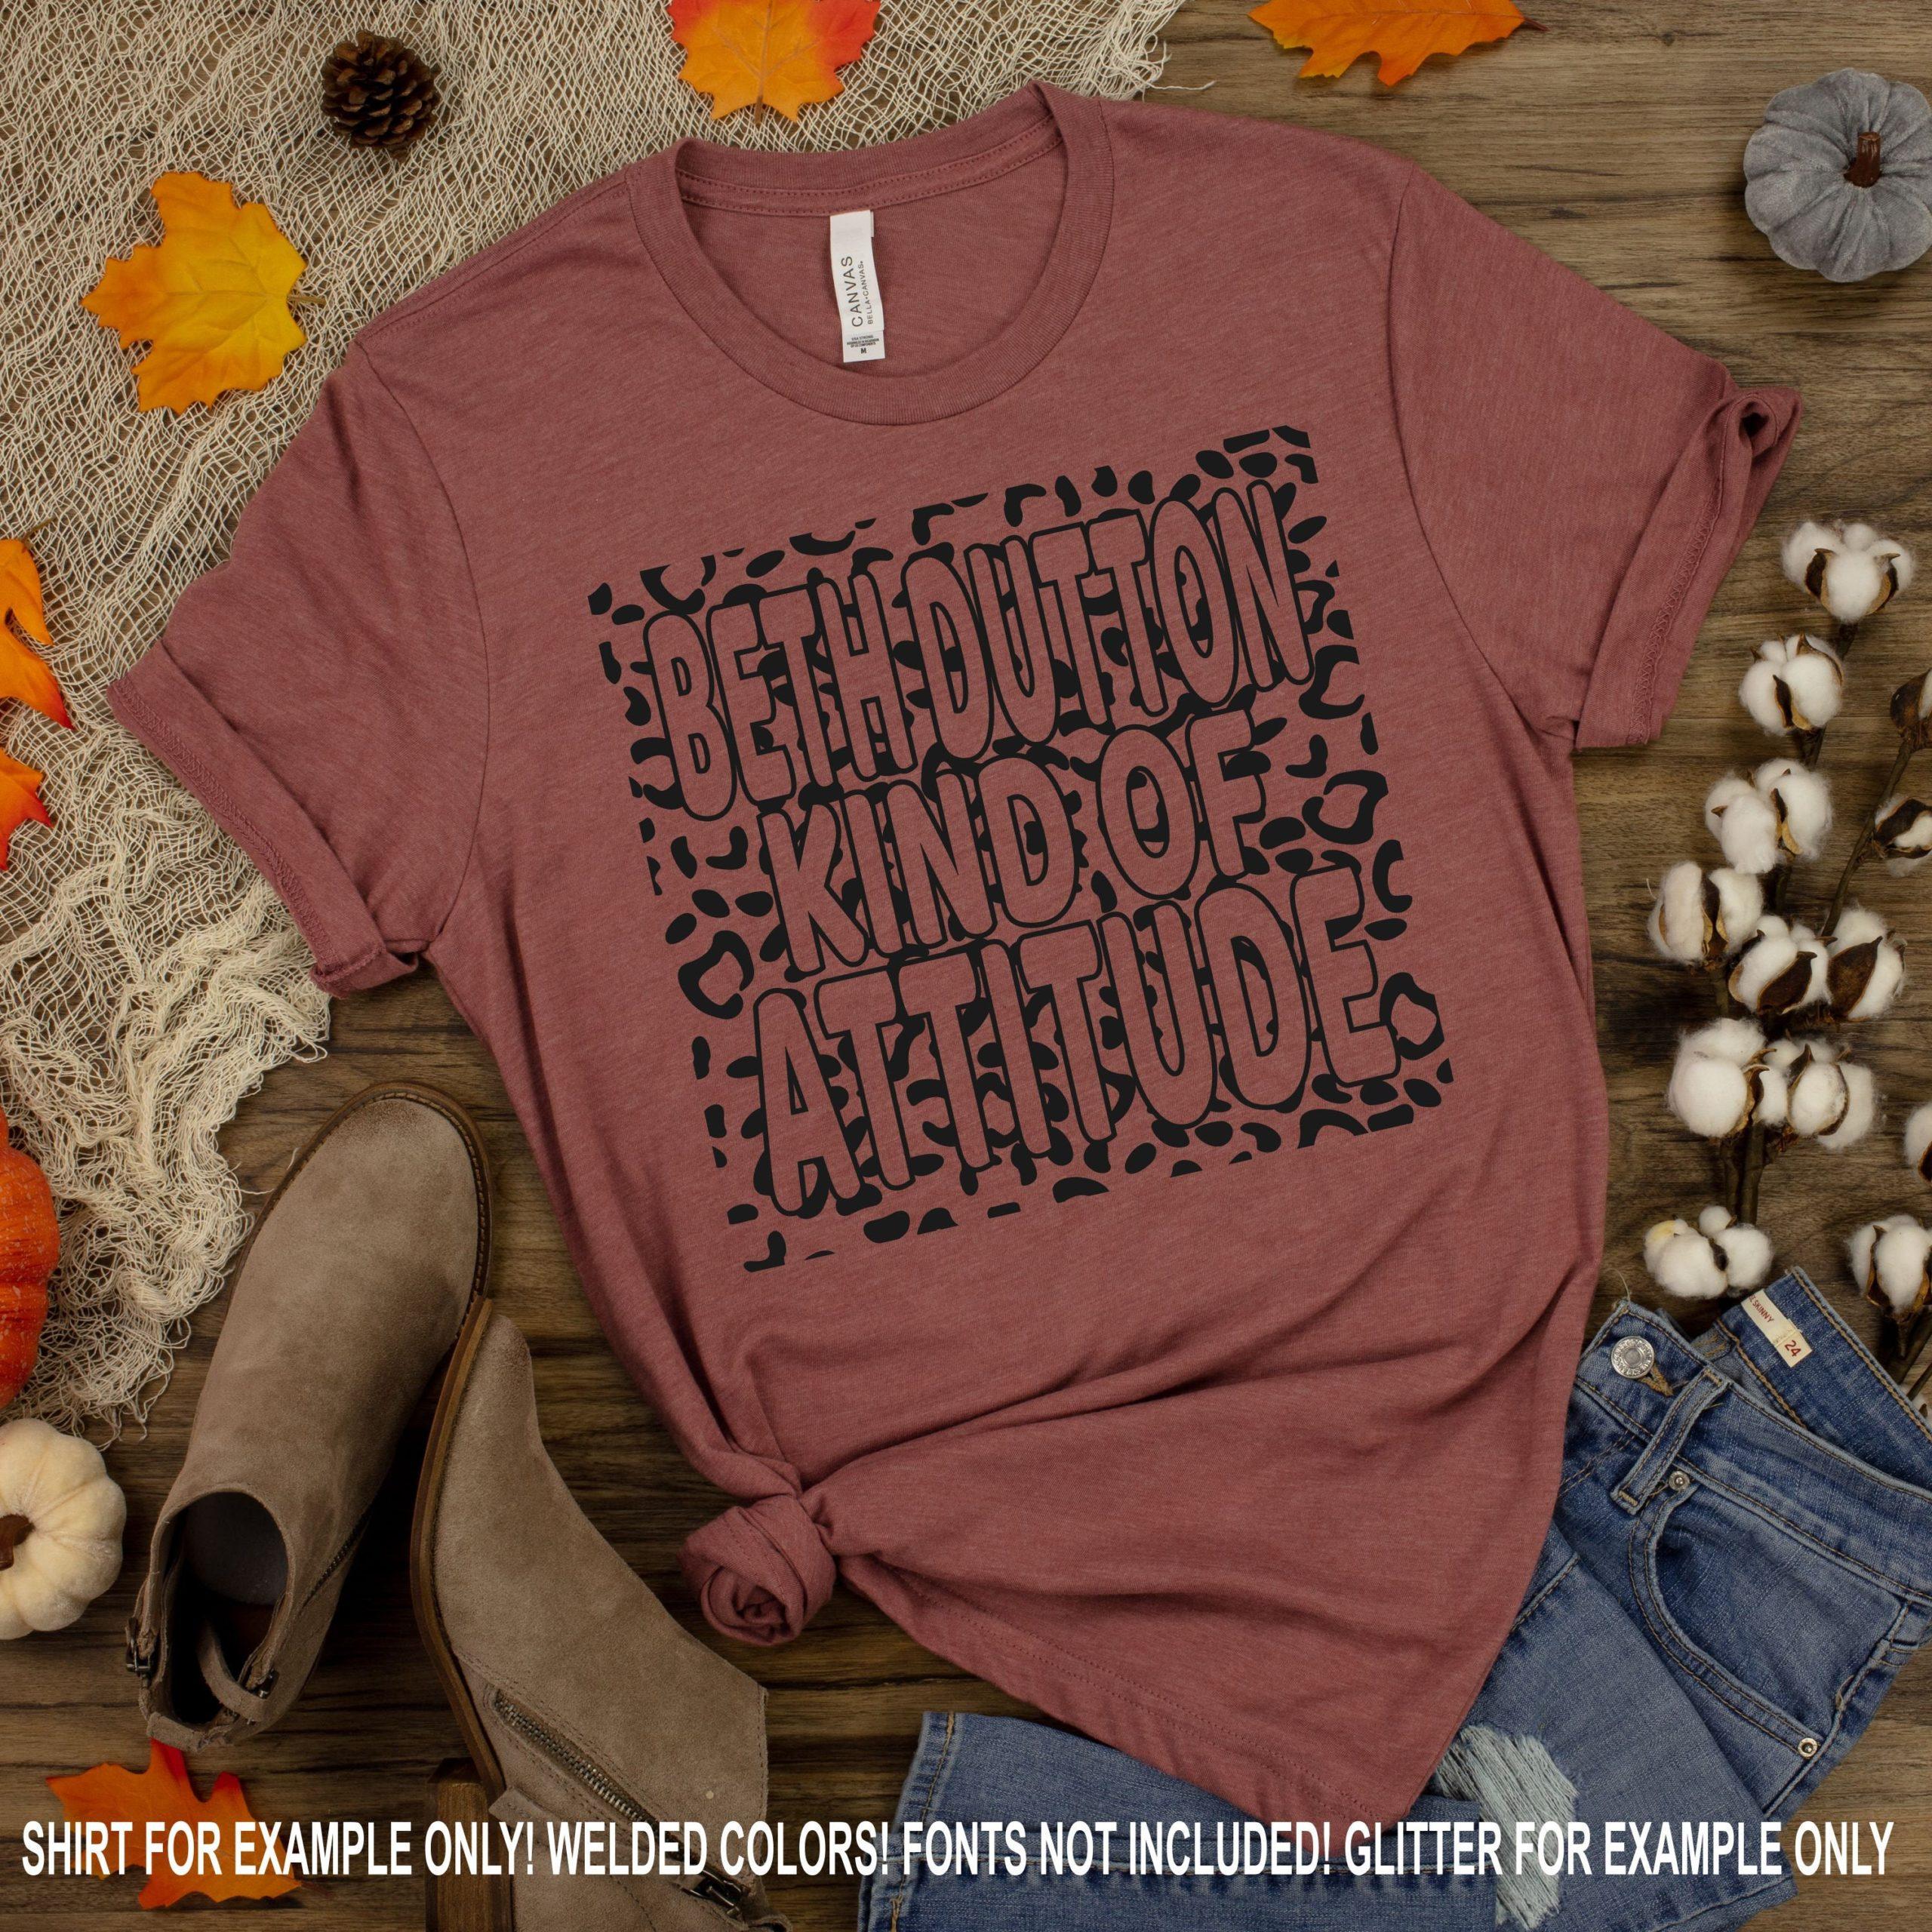 Beth-dutton-attitude-svg-yellowstone-svg-beth-dutton-svg-attitude-svgfunny-svg-yellowstone-tv-svg-cut-filecricut-svg-svg-for-mobile-60514116